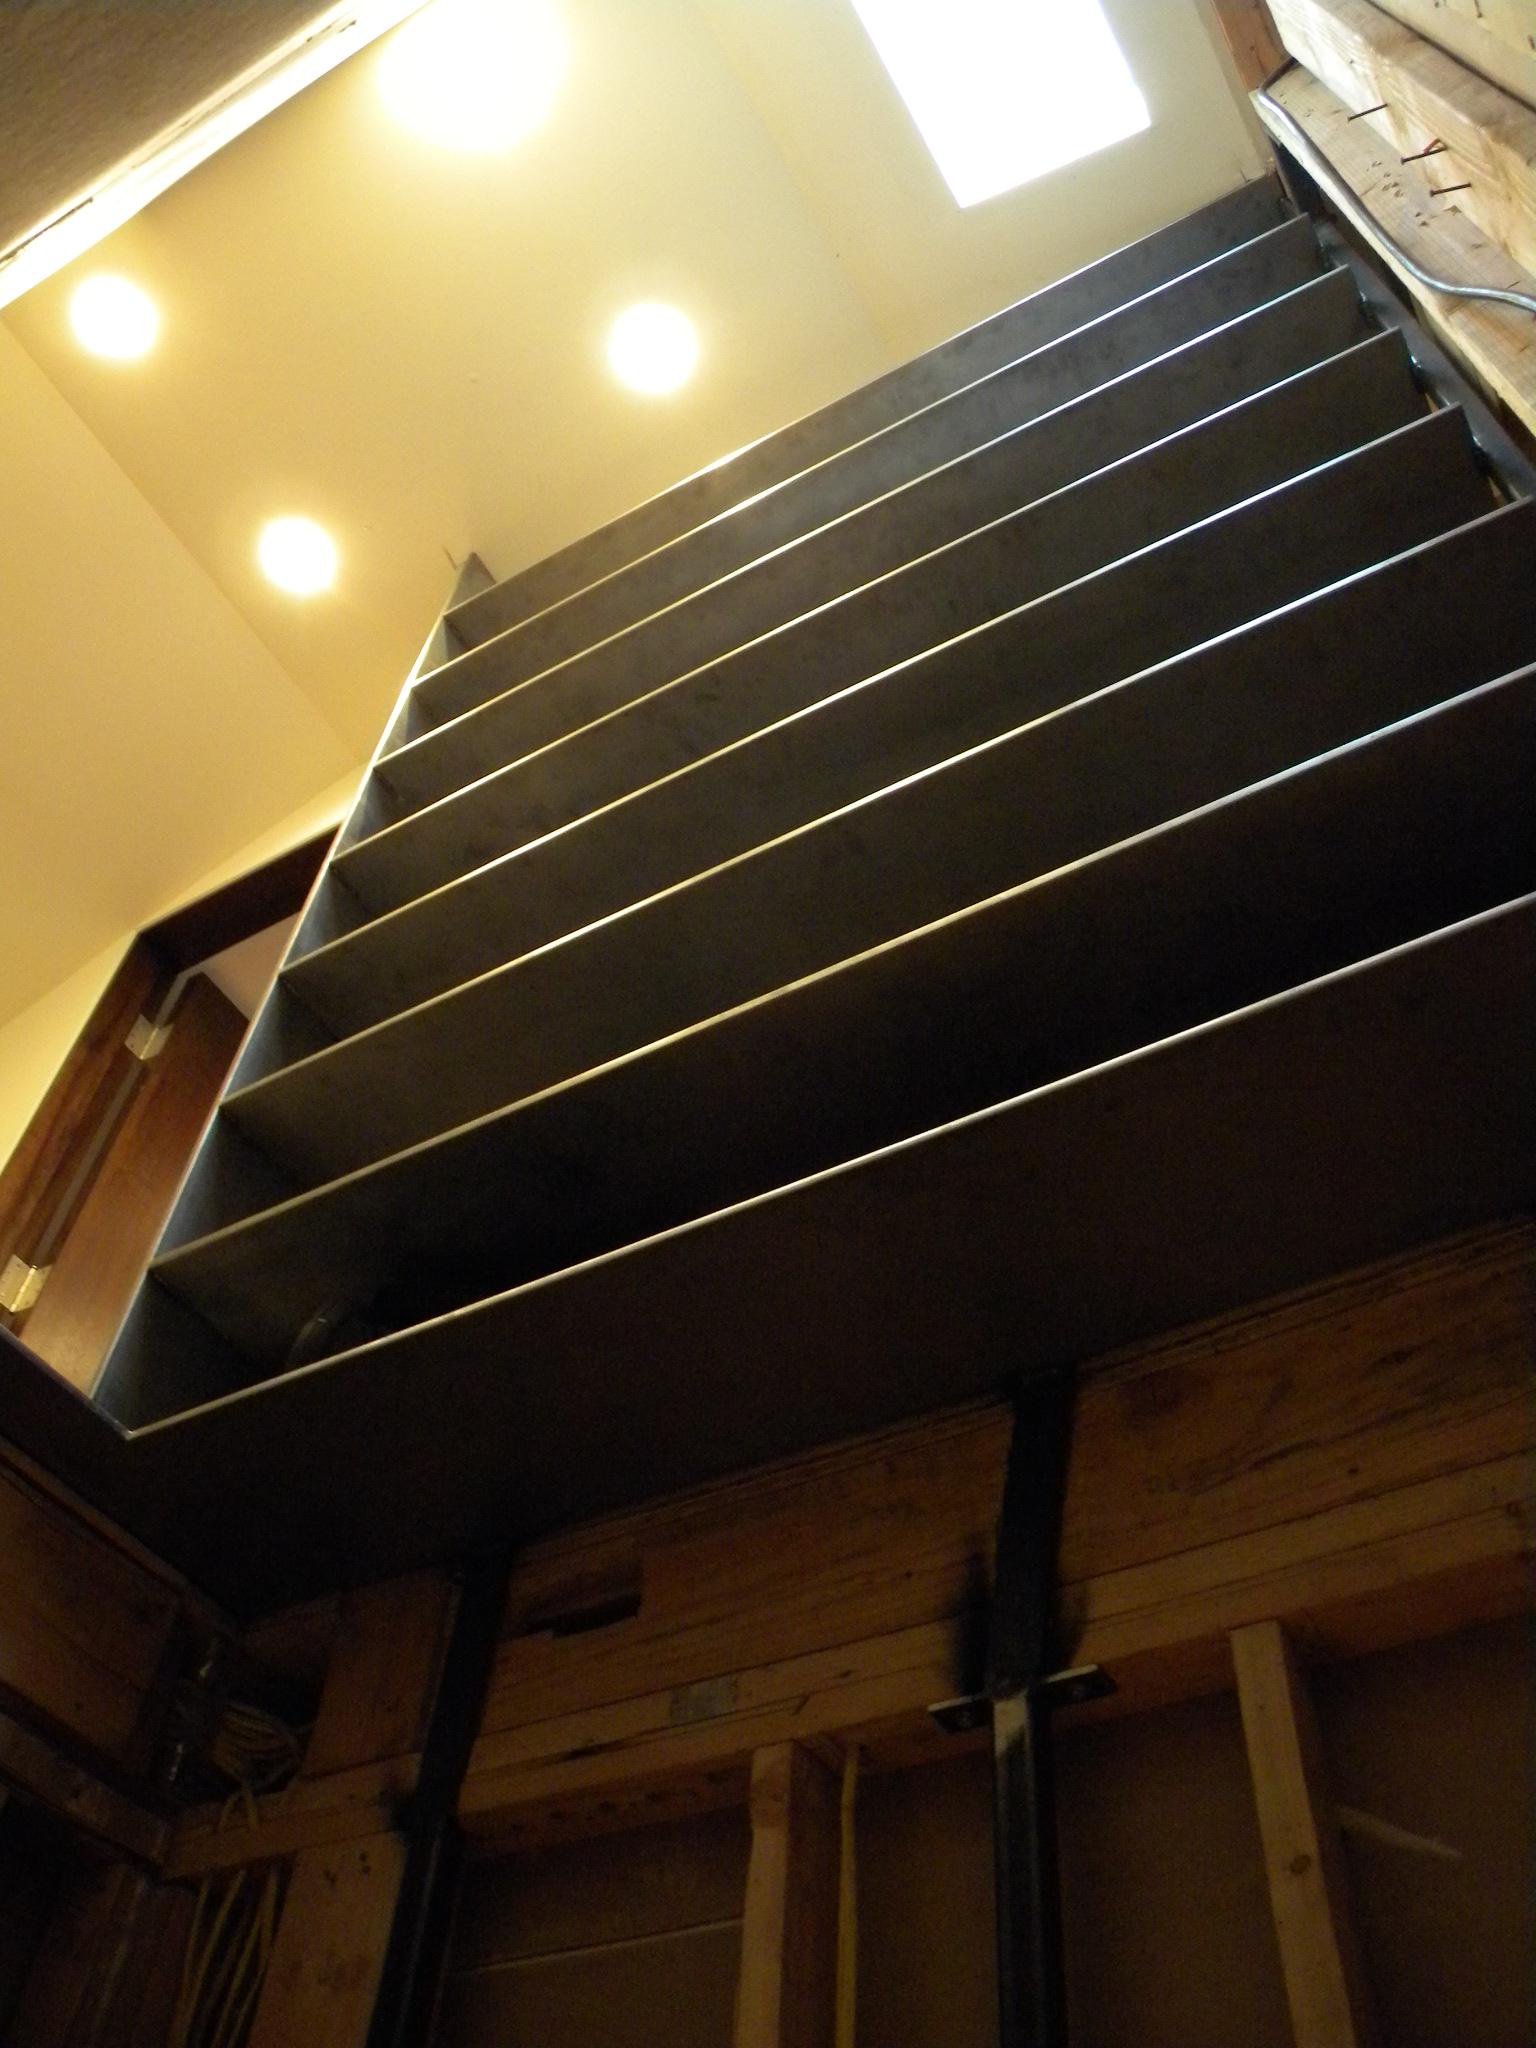 attic-staircase-ladder-in-attic-view-DSCN7232.jpg